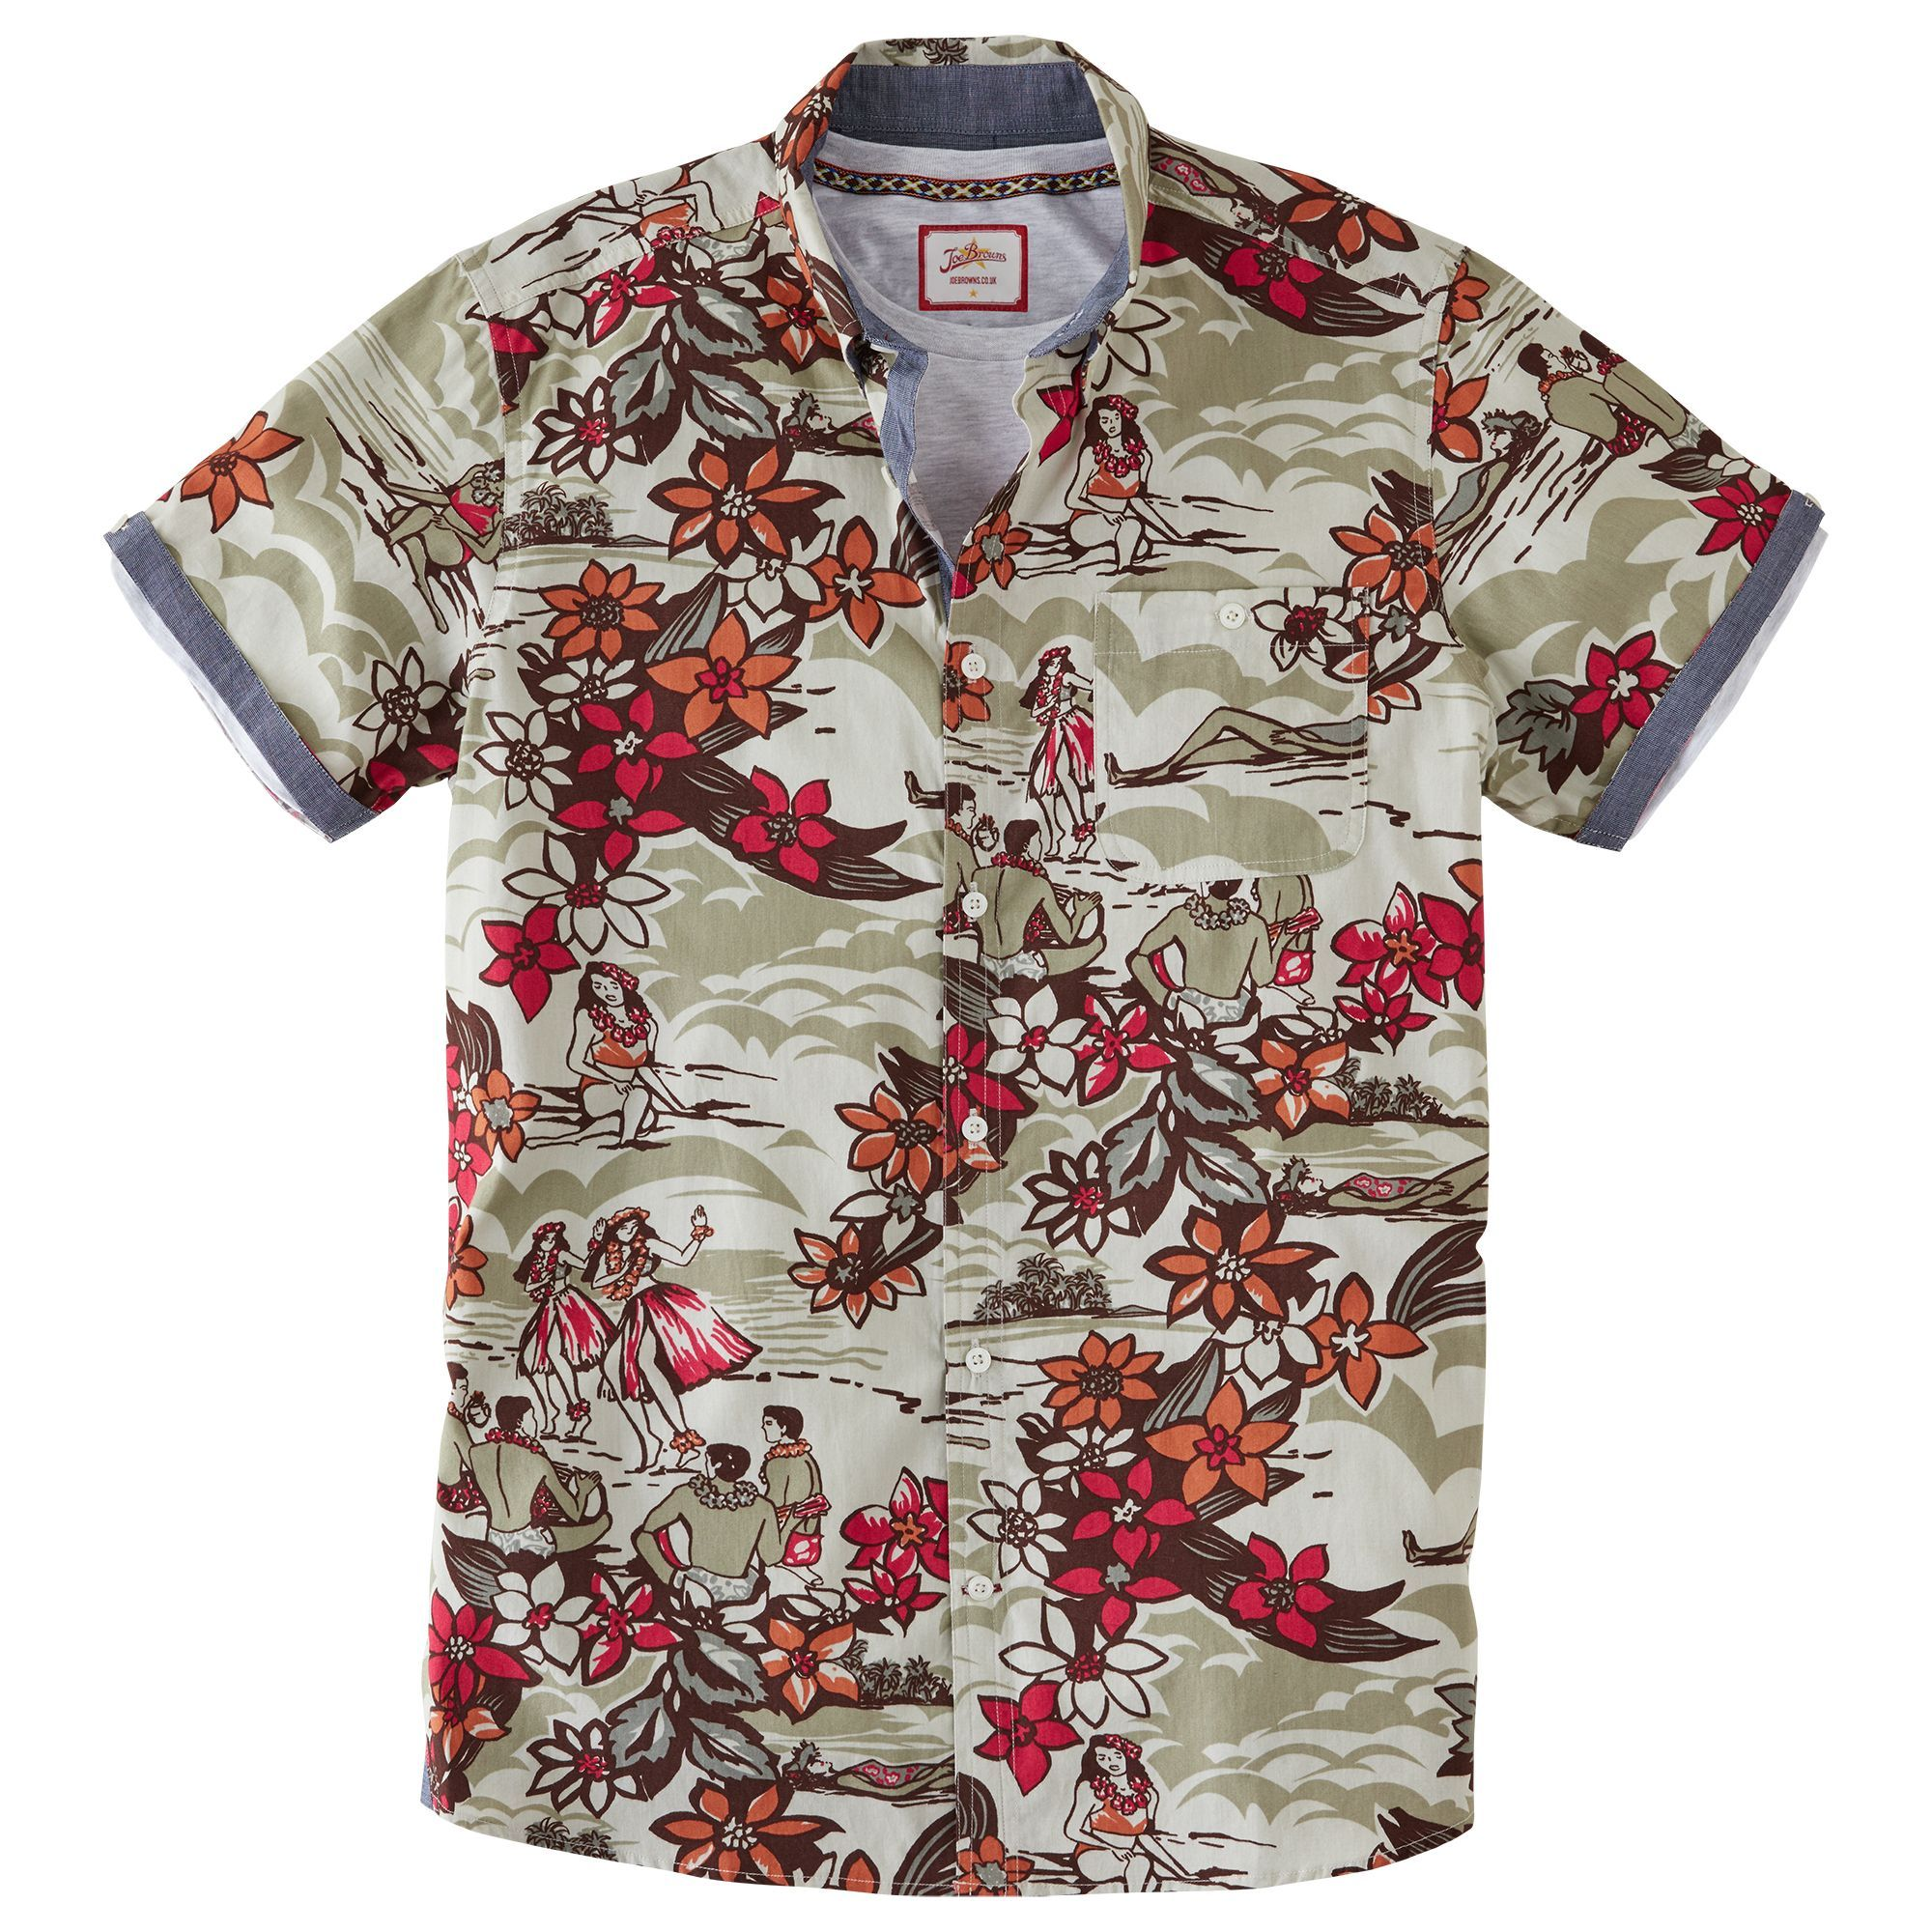 joe brown shirts